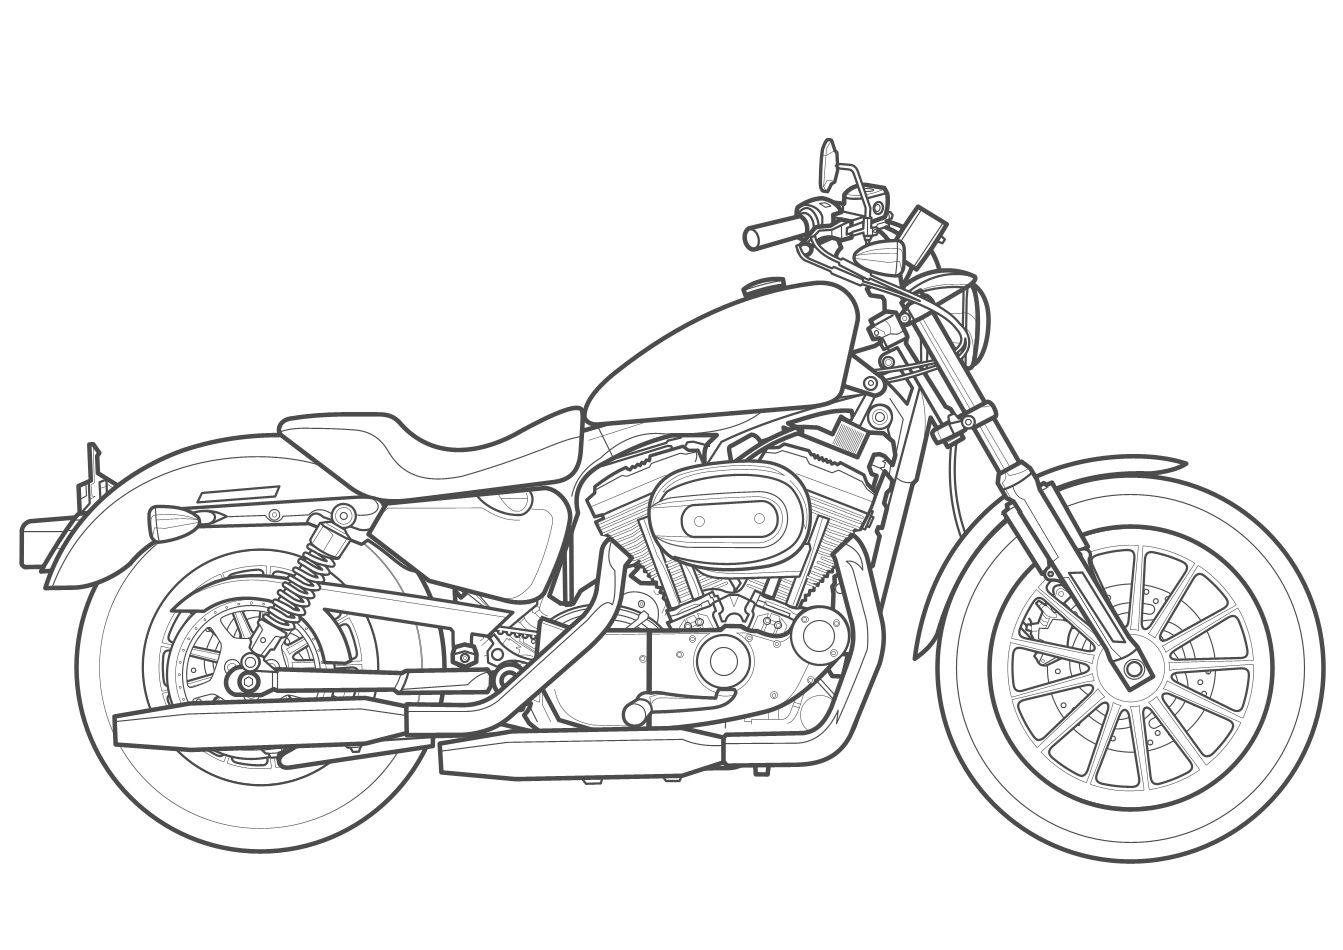 Harley Davidson S 100th Anniversary Bike Motorcycle Drawing